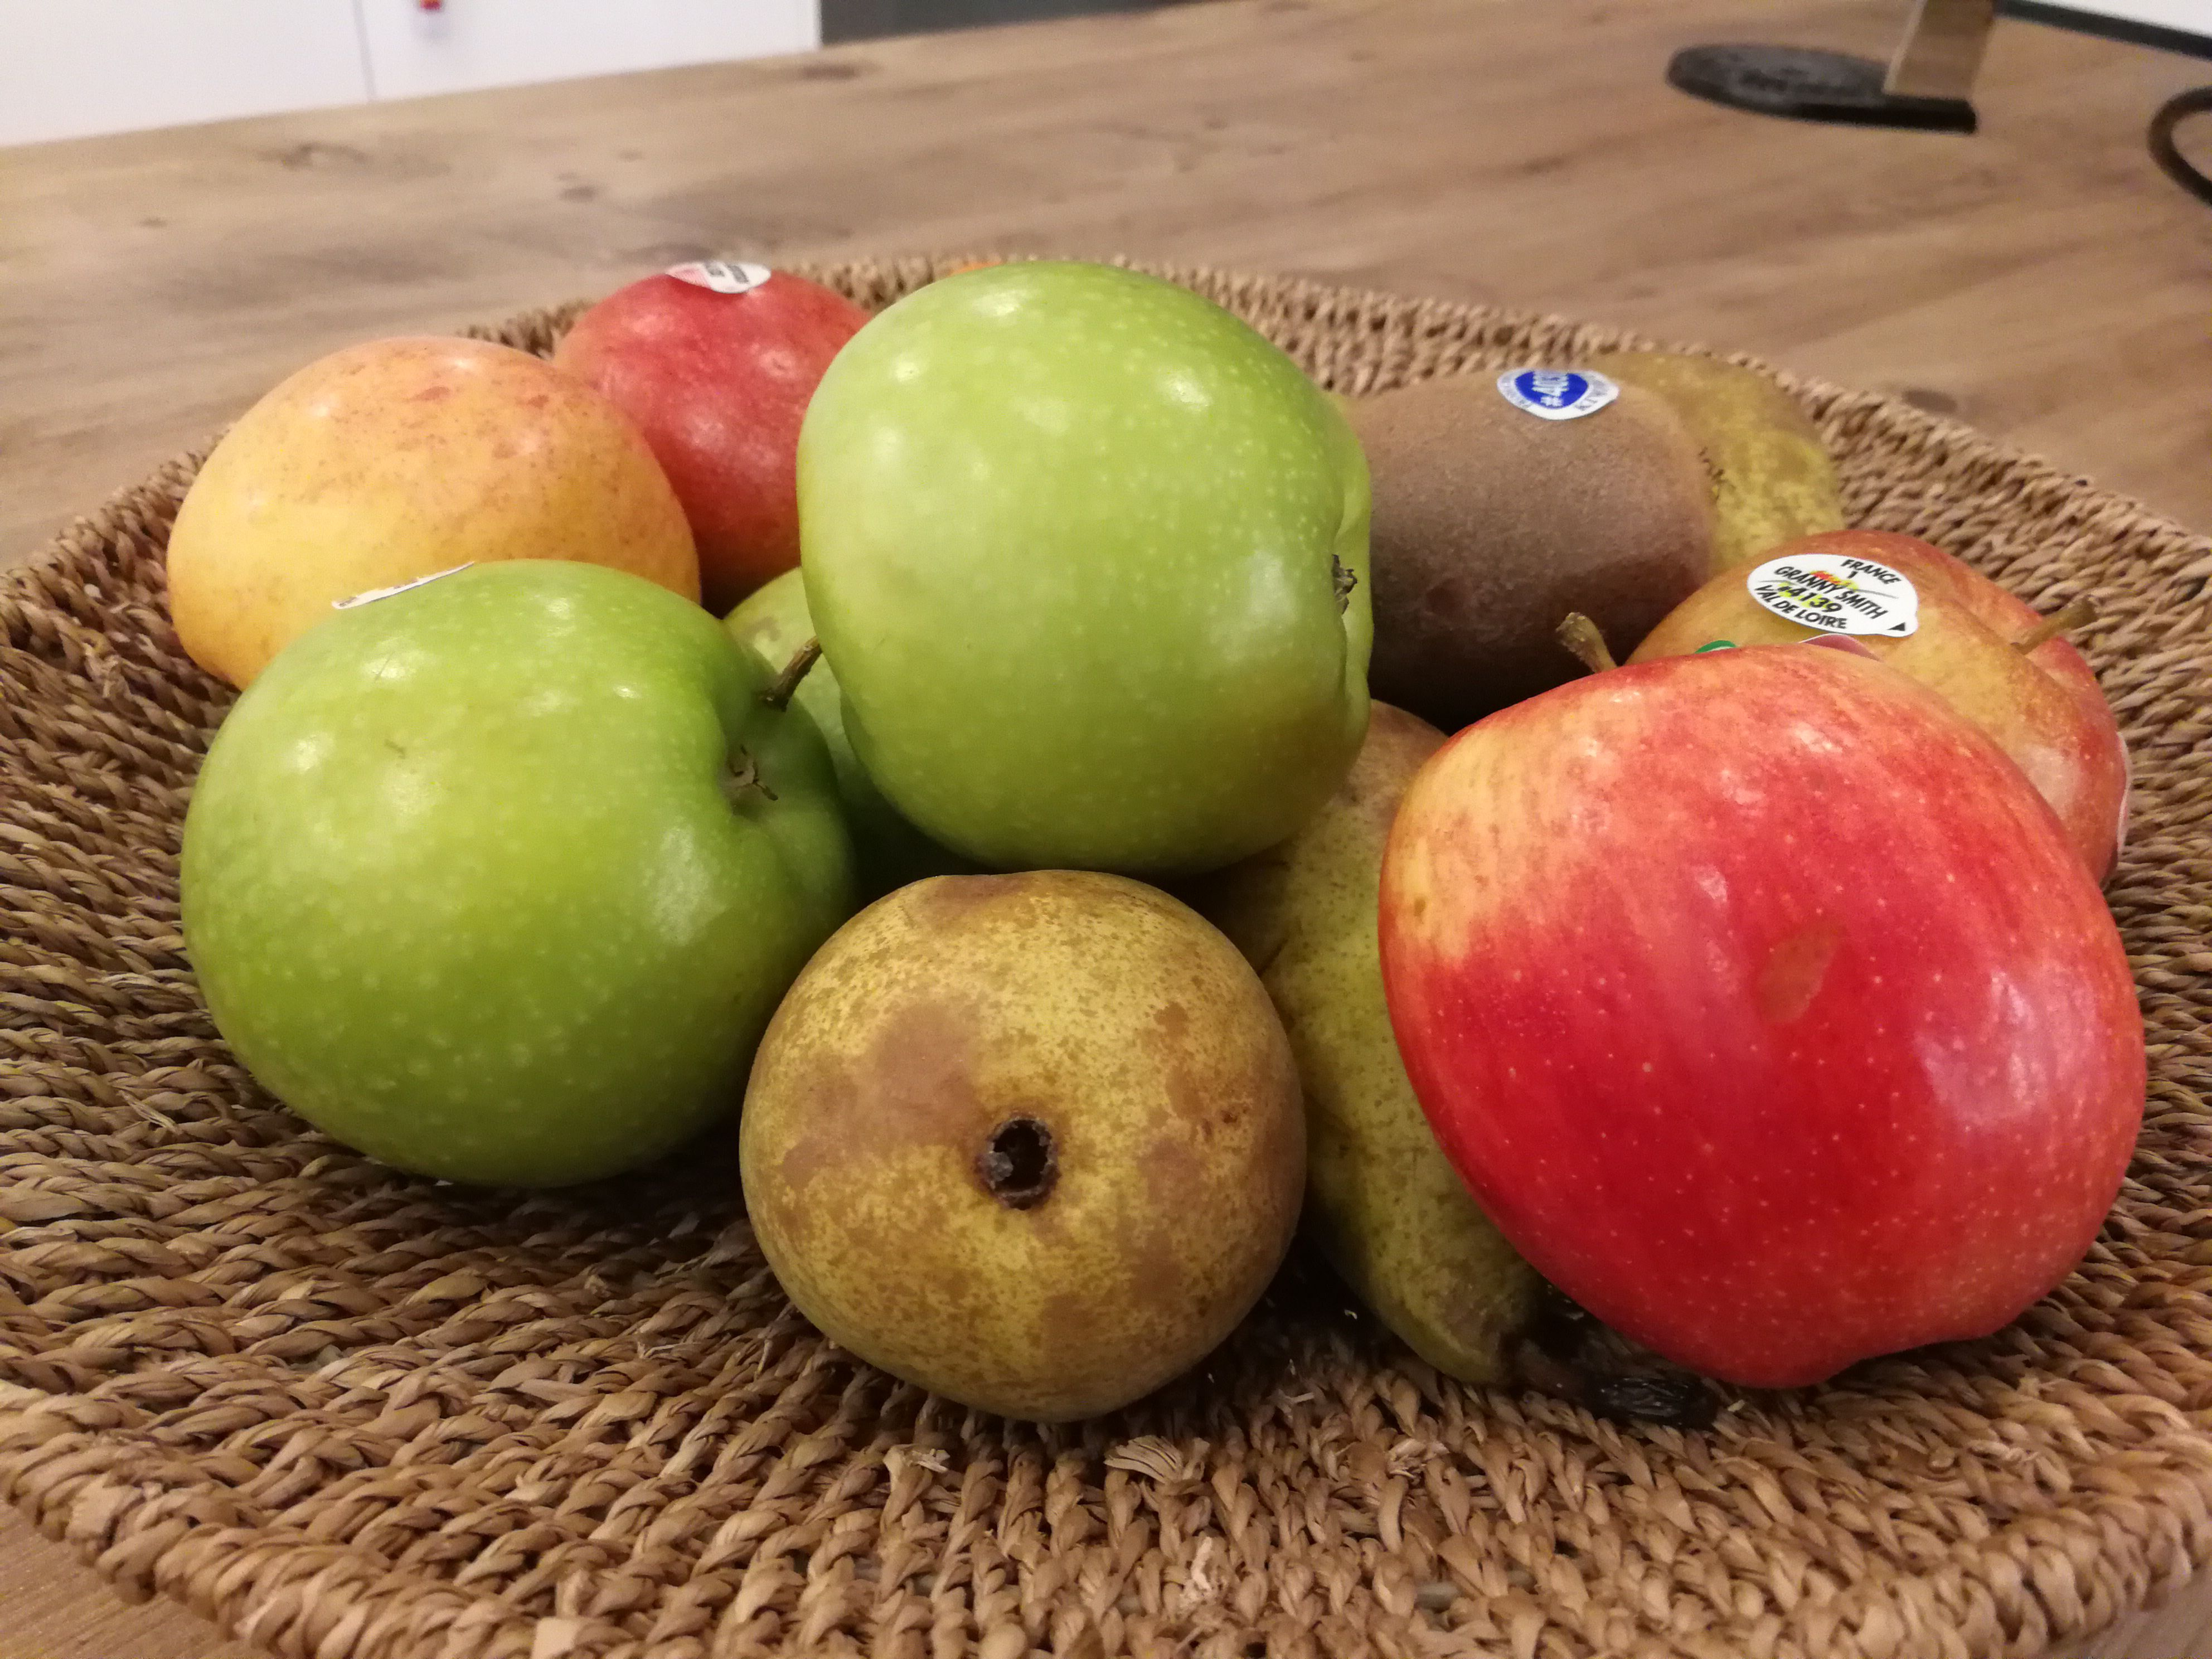 fruit-low-light-mate-9-camera.jpg